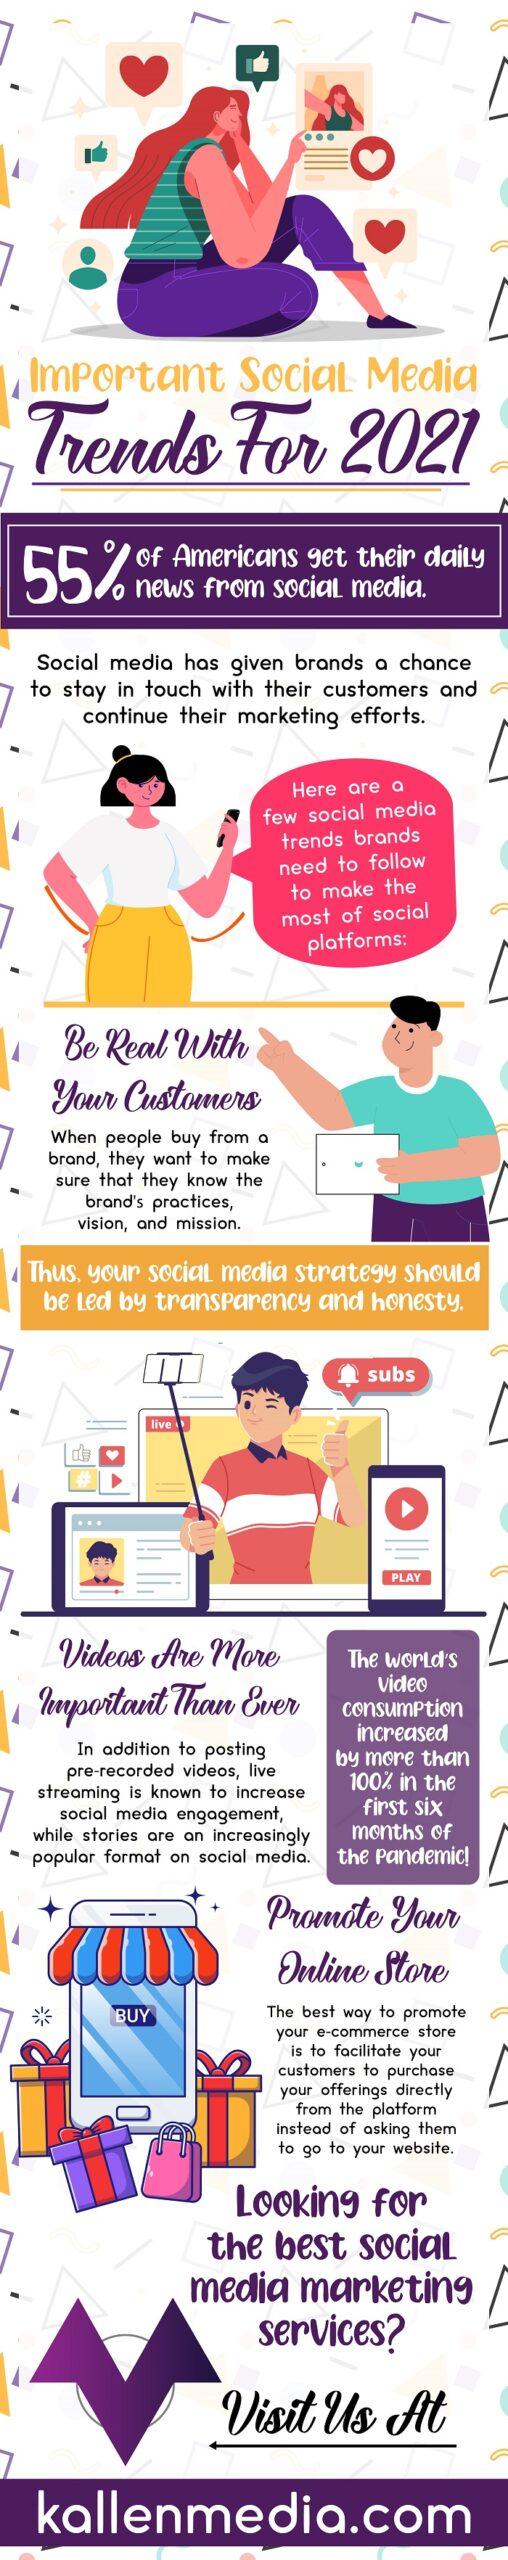 Important-Social-Media-Trends-For-2021